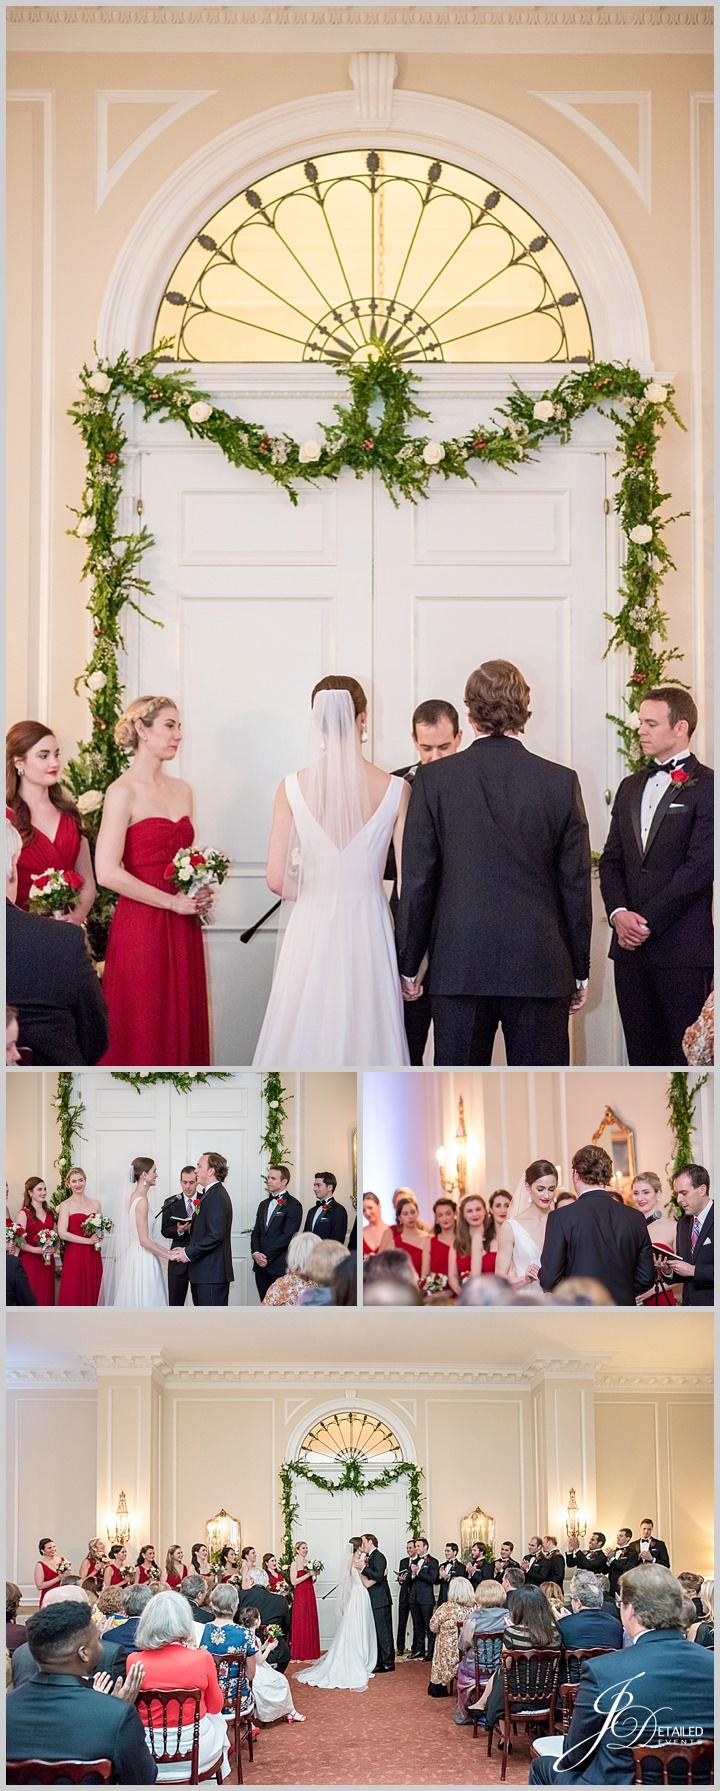 chicago-wedding-planner-jdetailed-events_2043